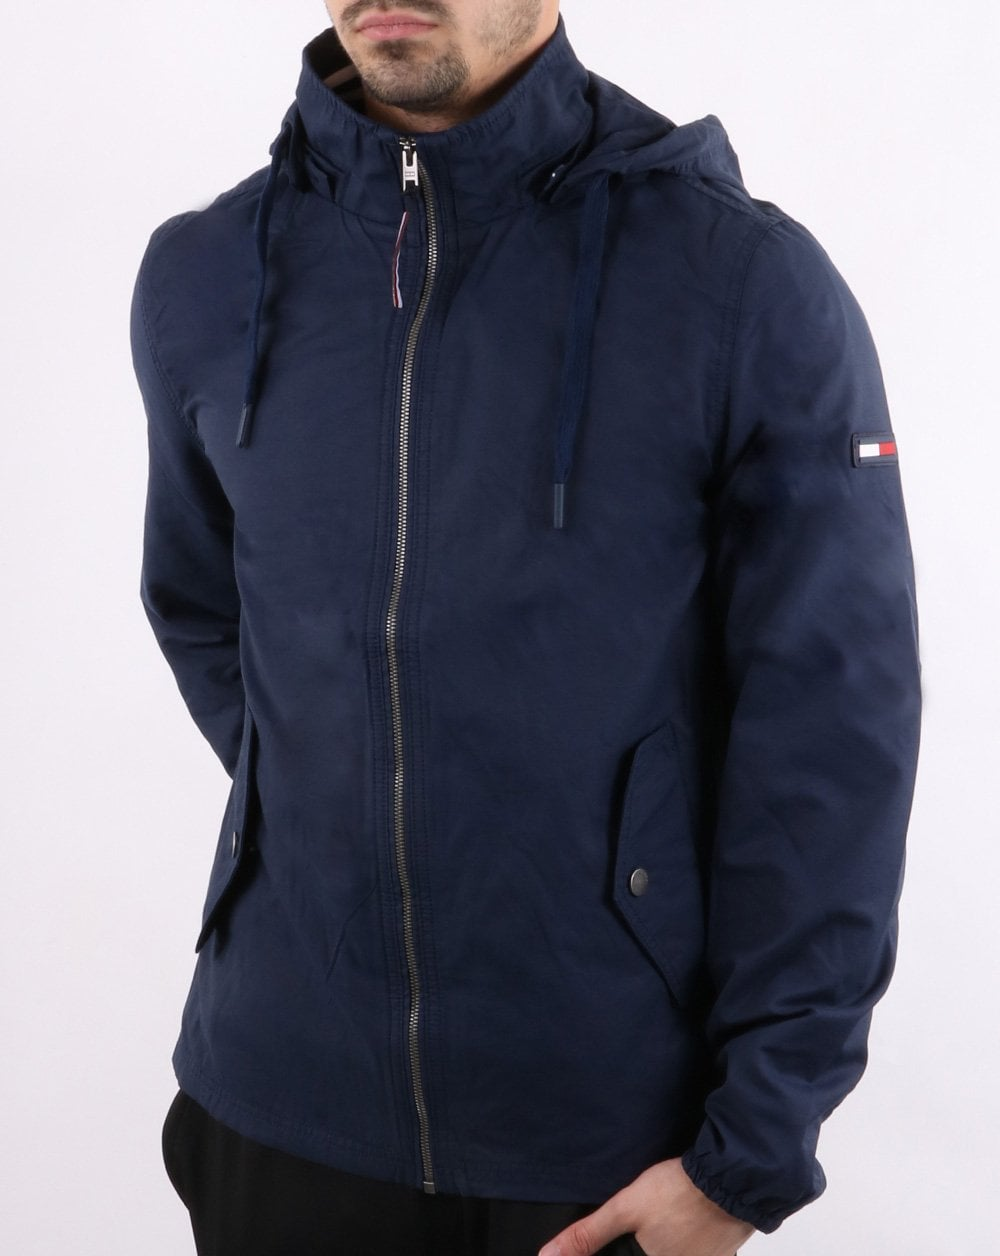 5b2d5c3f4a Tommy Hilfiger Jeans Tommy Hilfiger Hooded Jacket Navy